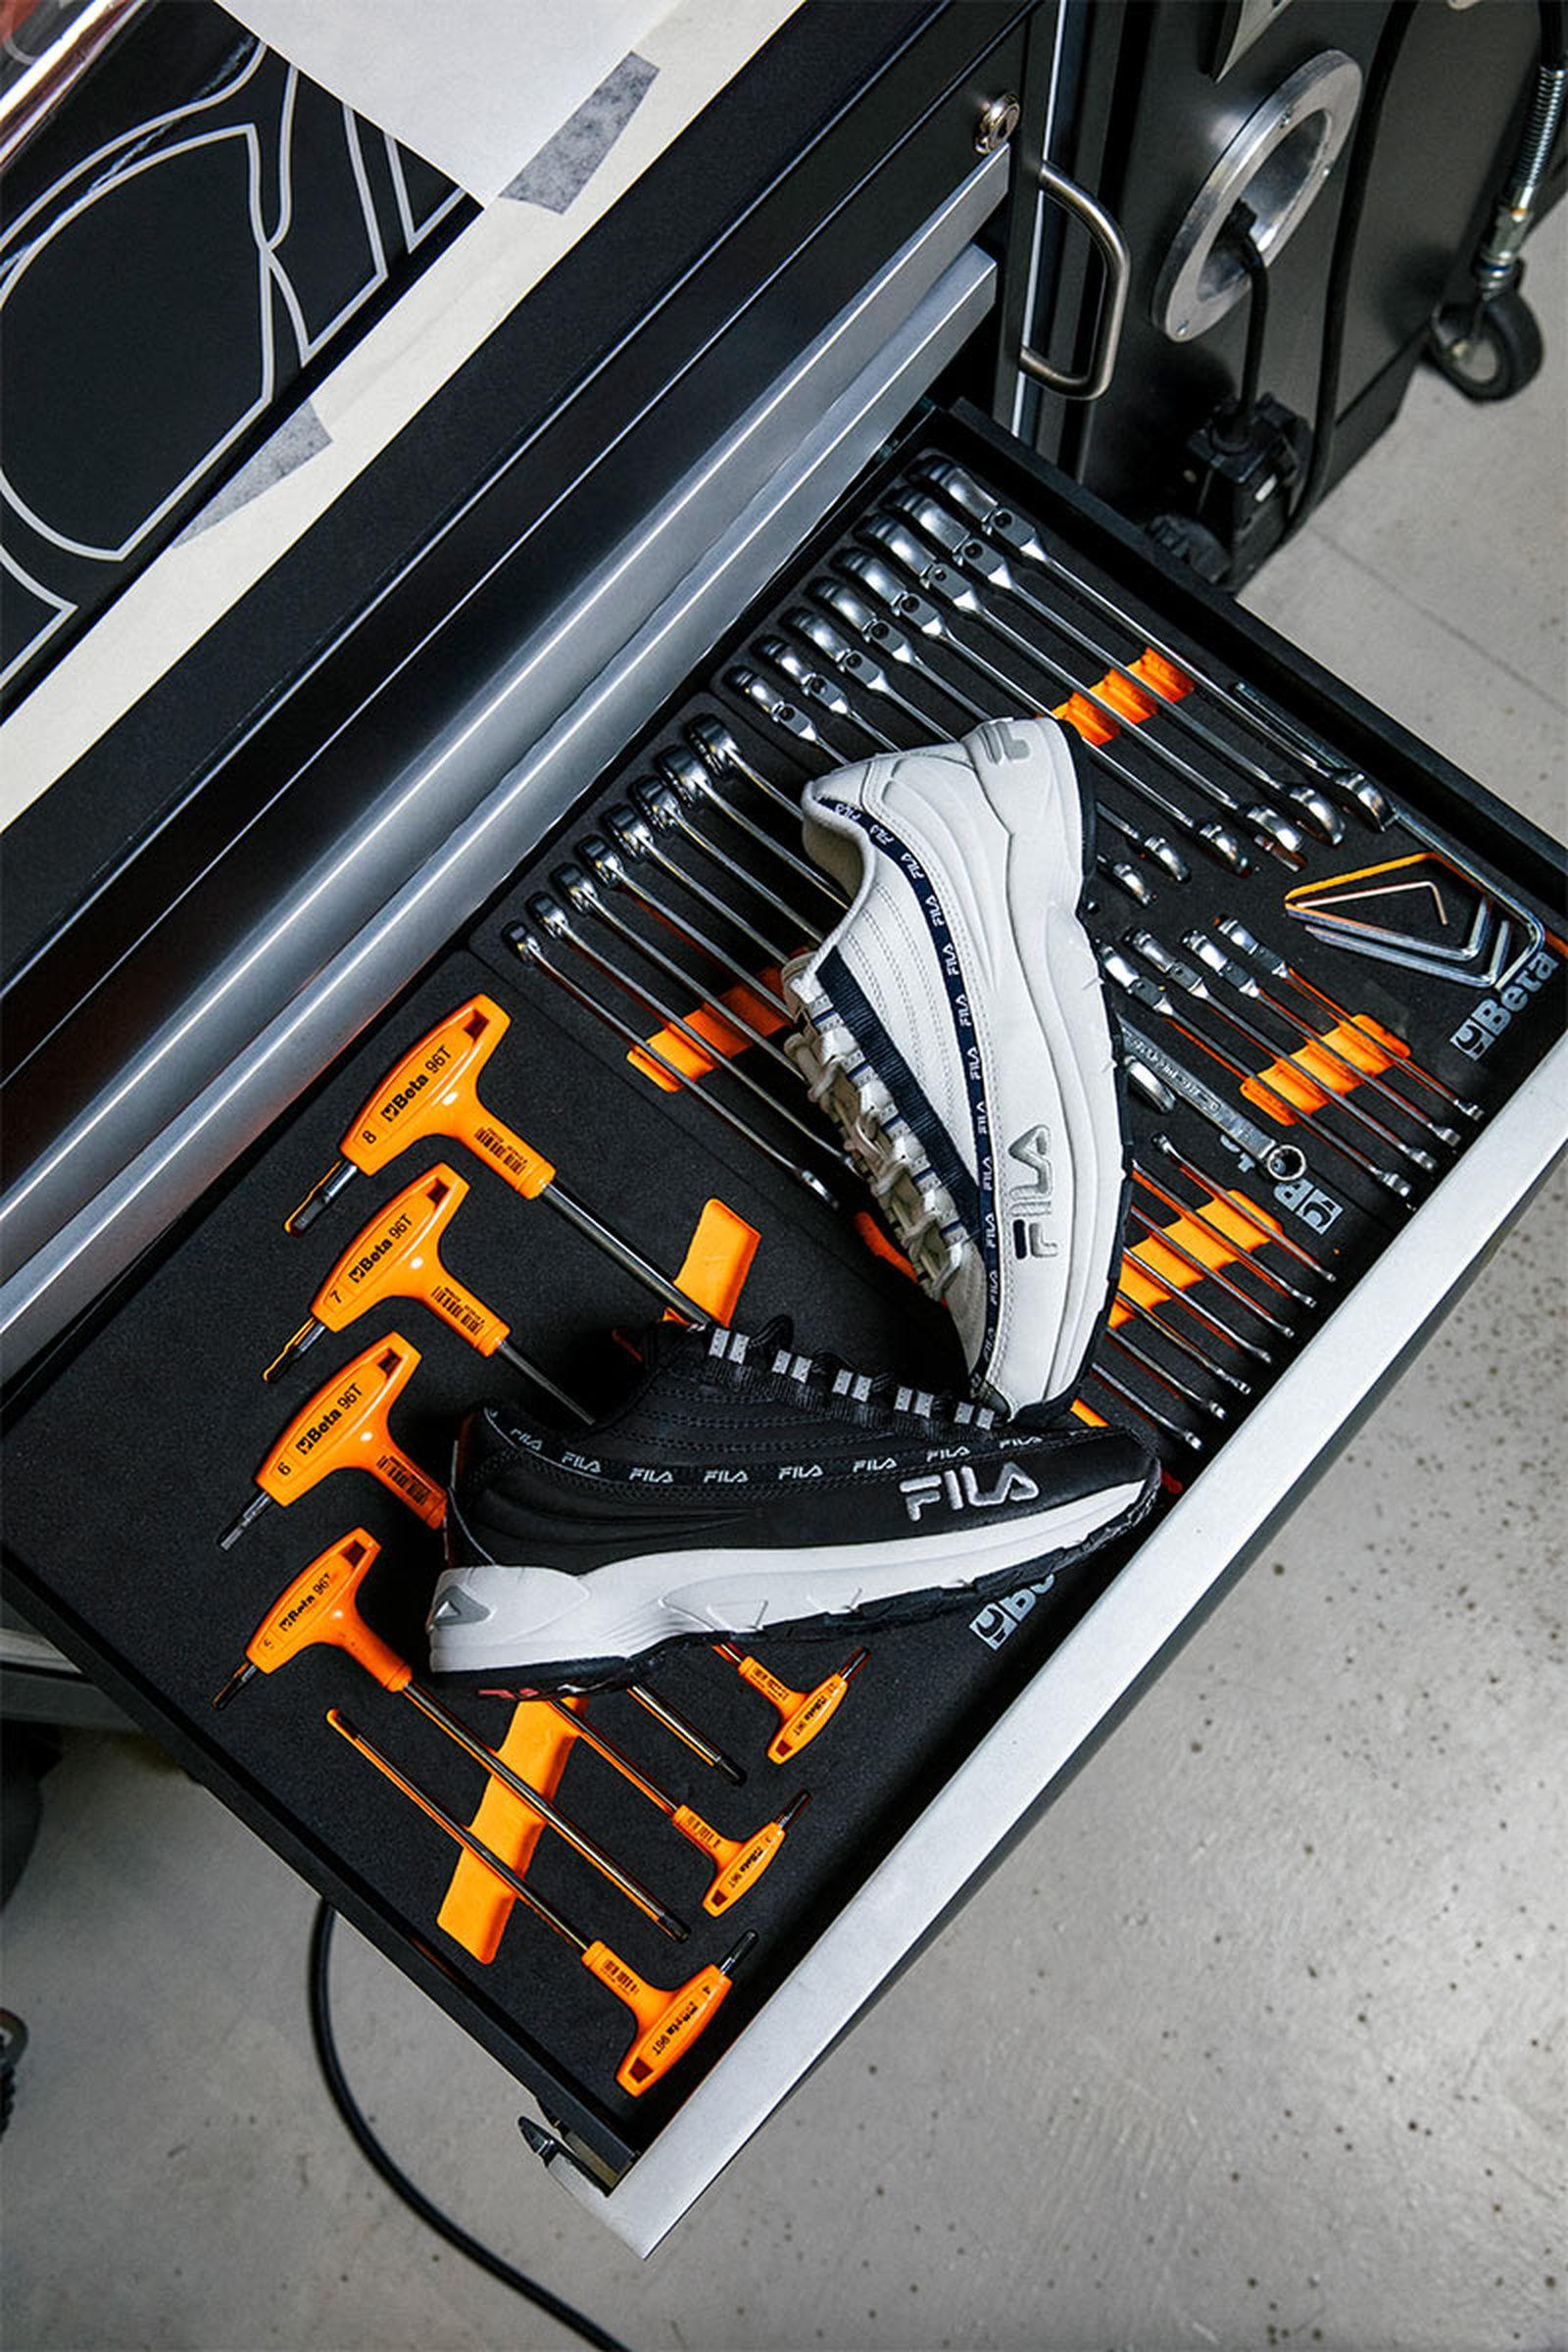 filas dstr97 leather release date price fila dstr 97